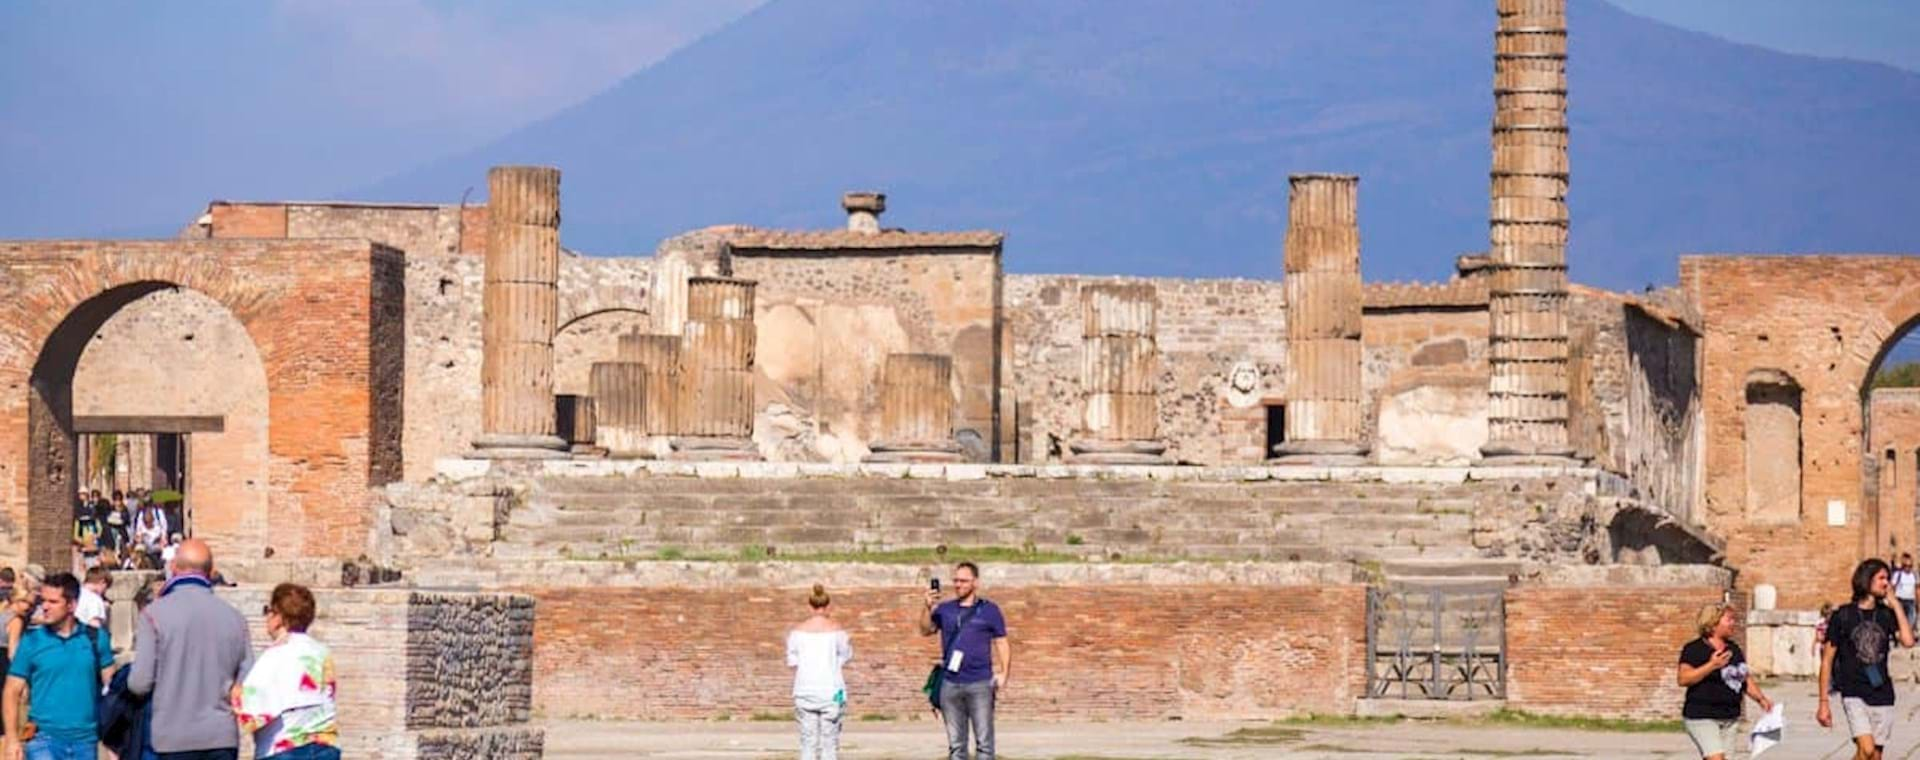 people walking around Pompeii